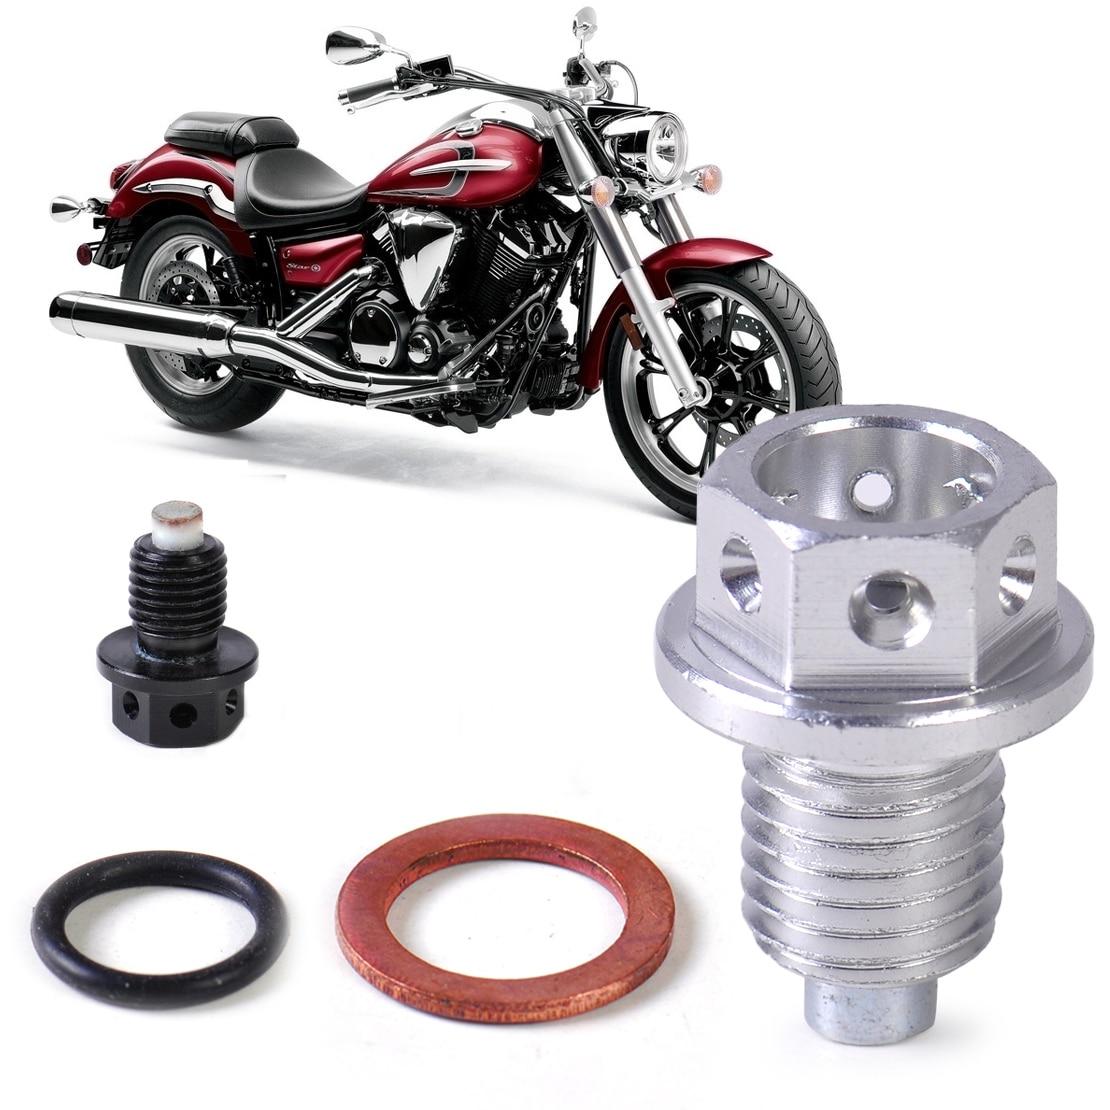 m12 magnetic engine oil pan pan drain filter adsorb. Black Bedroom Furniture Sets. Home Design Ideas